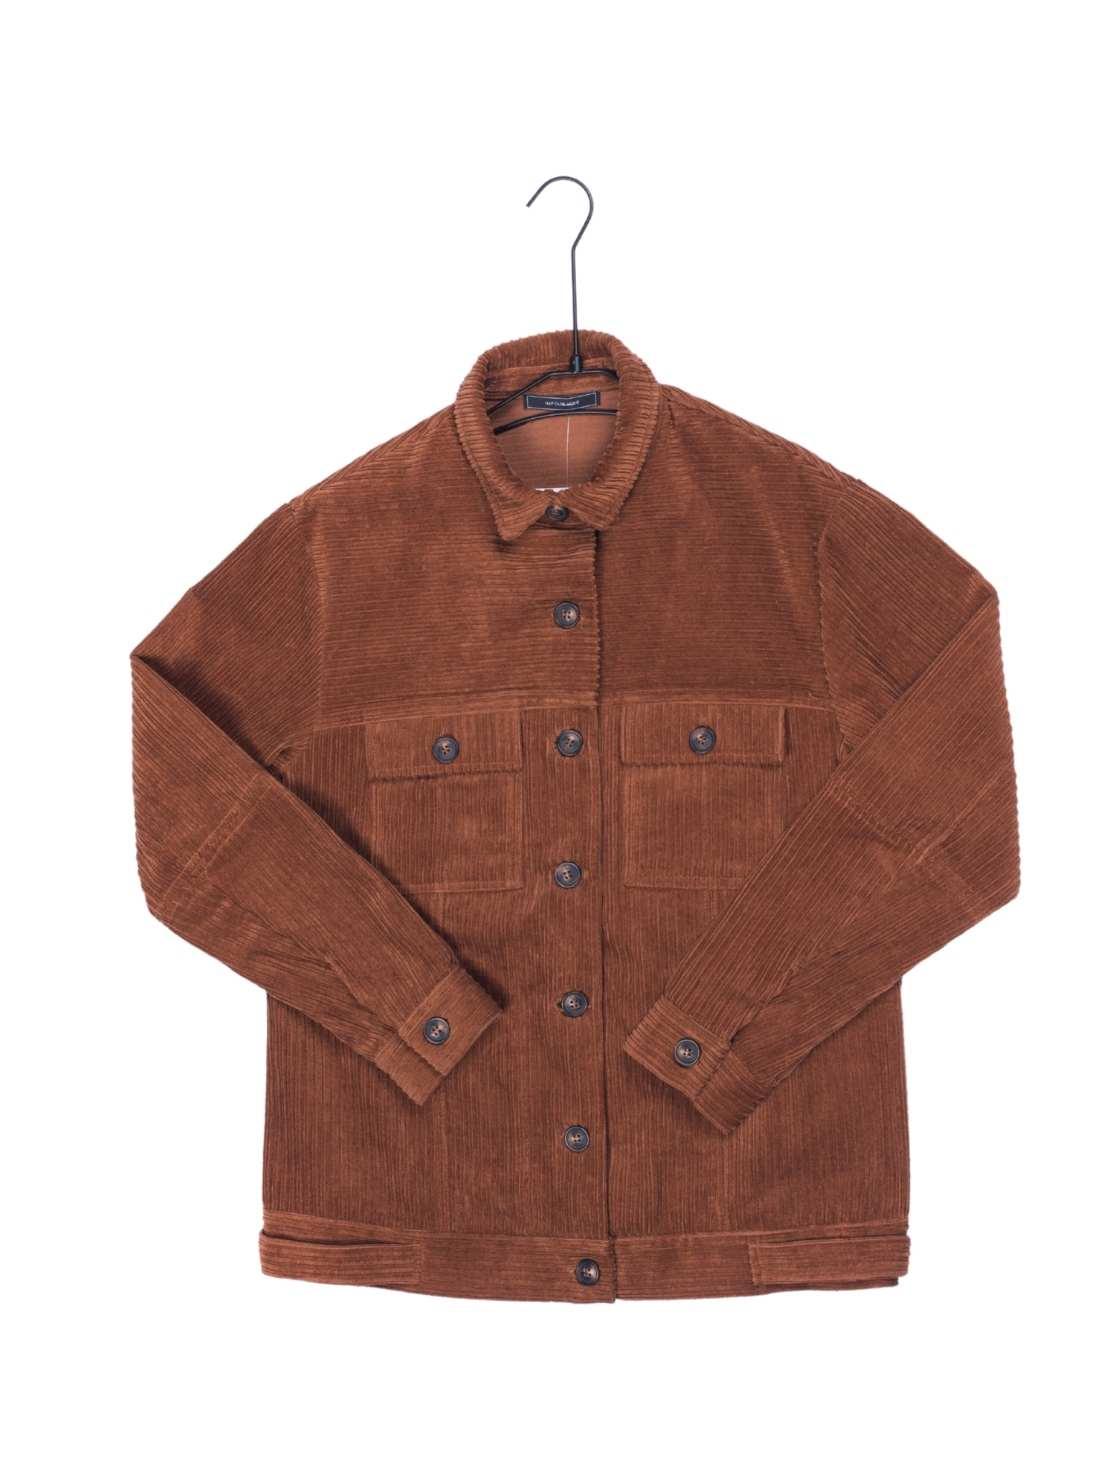 Ladies Cotton Corduroy Jackets